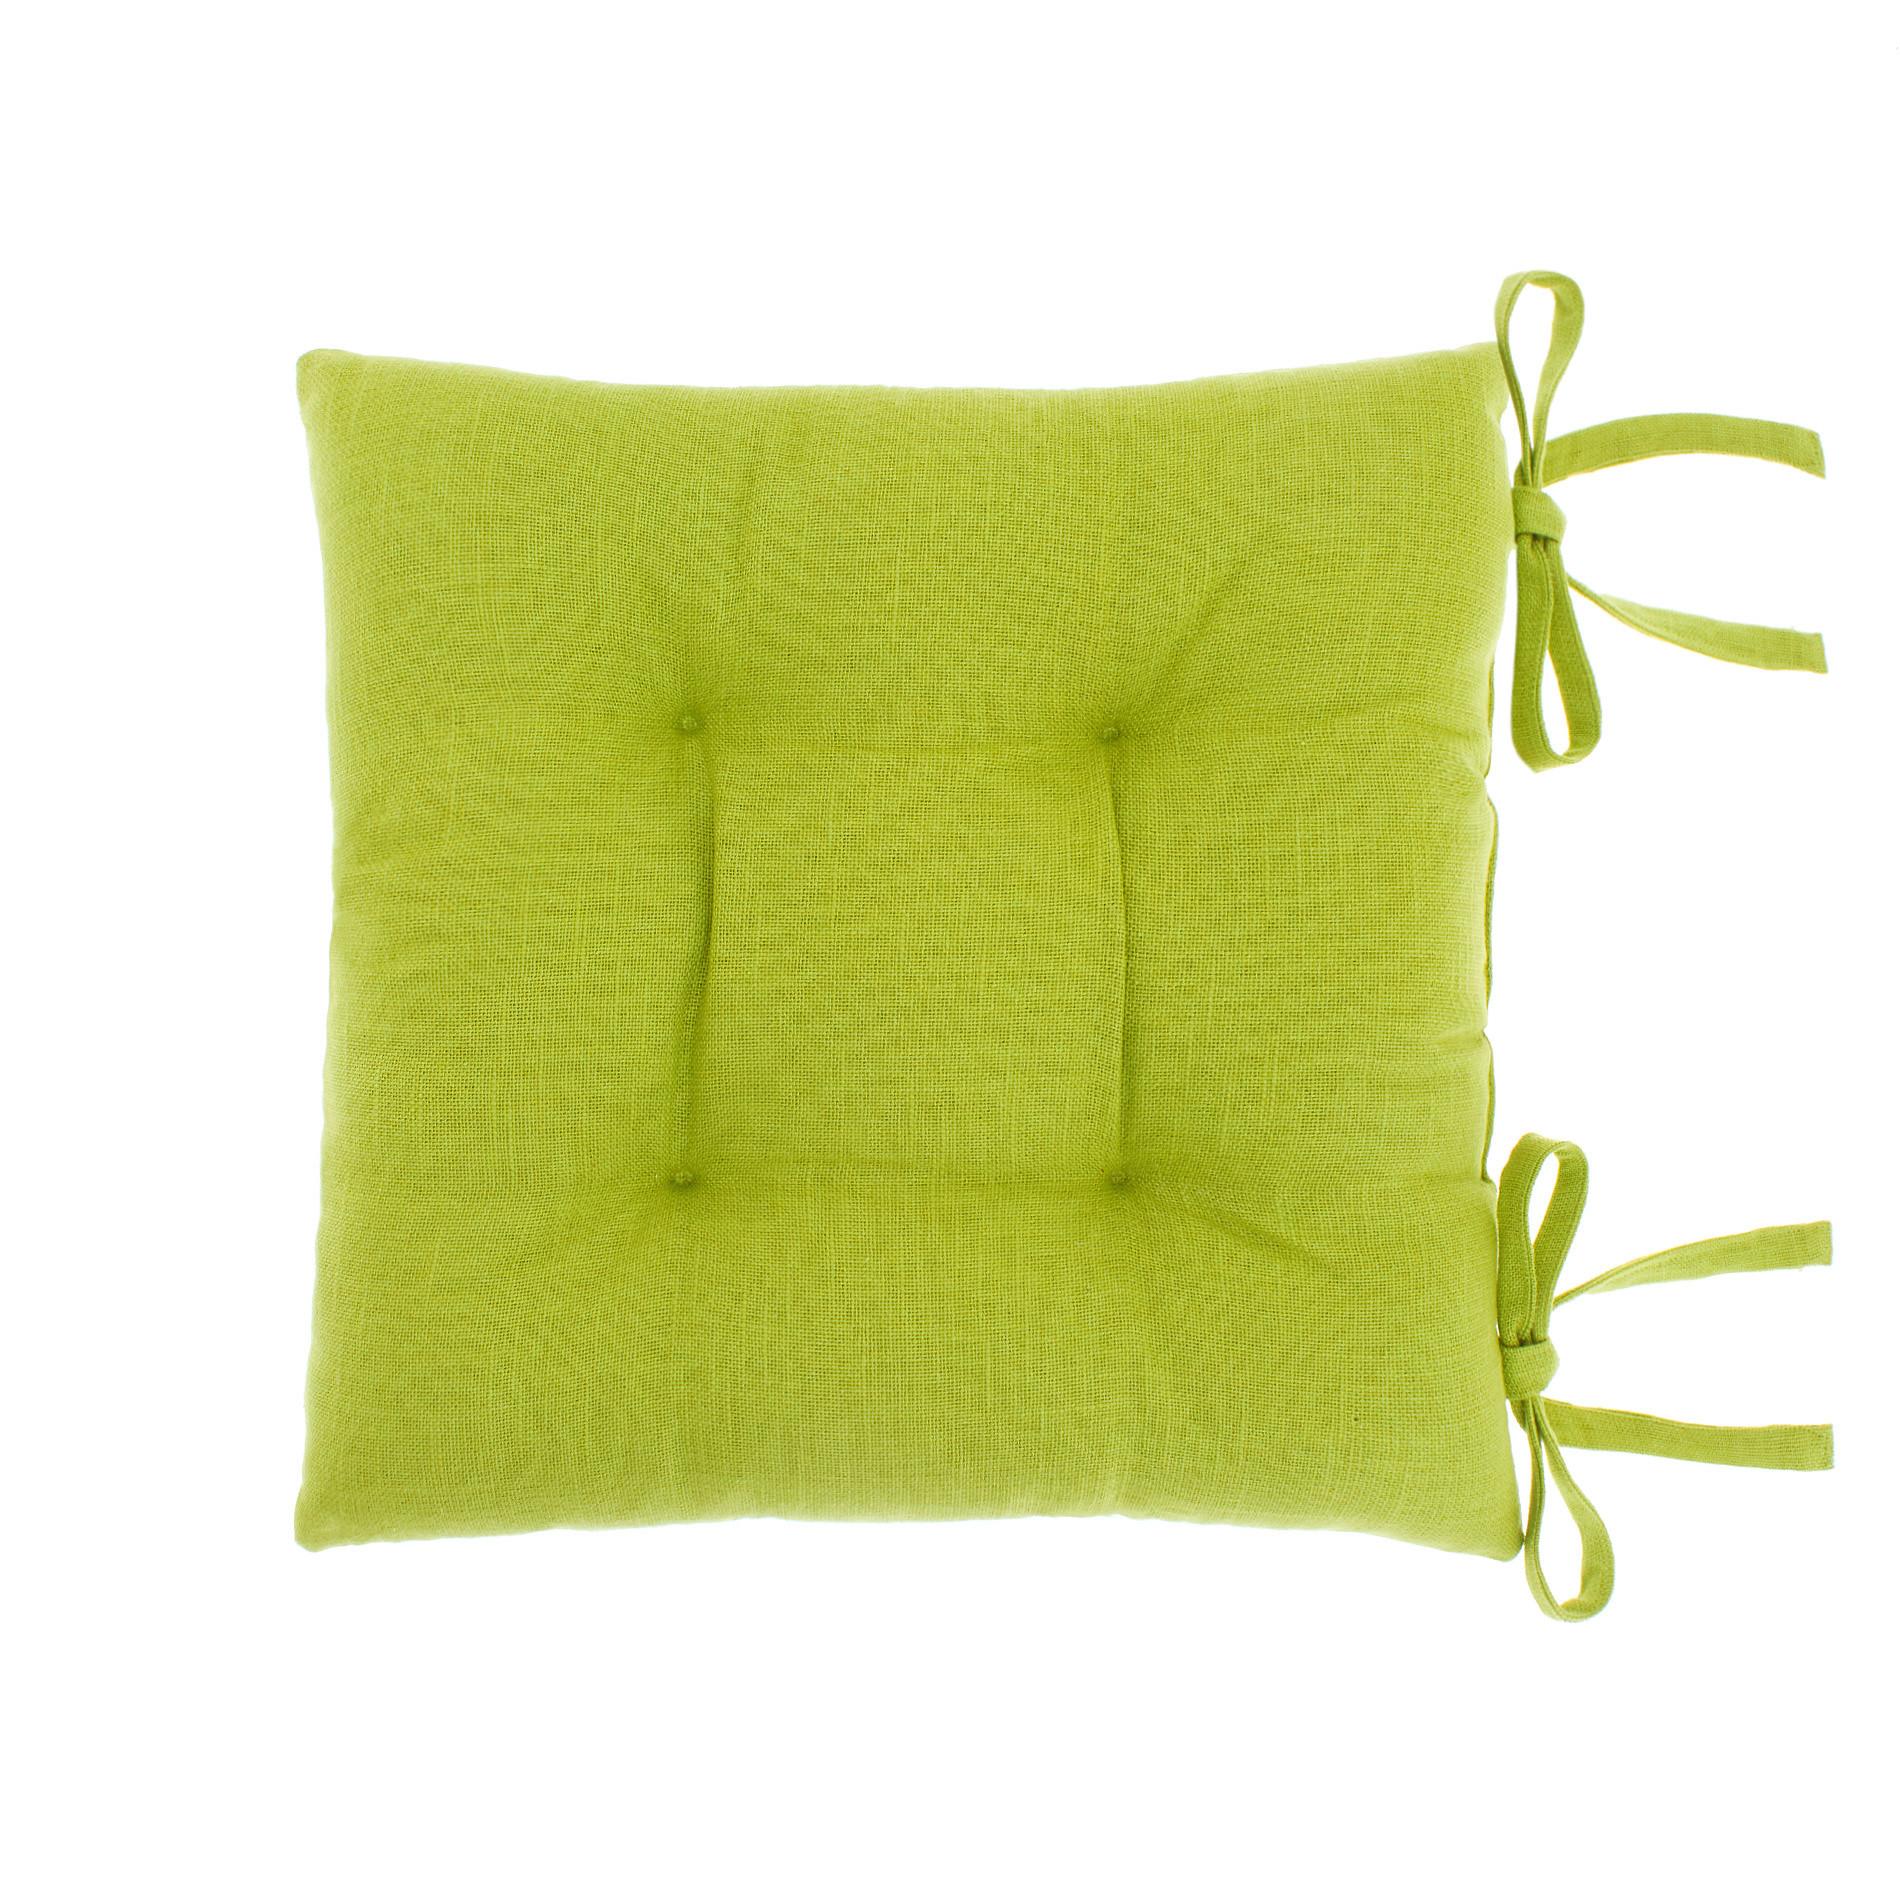 Cuscino da sedia puro cotone fiammato, Verde mela, large image number 0